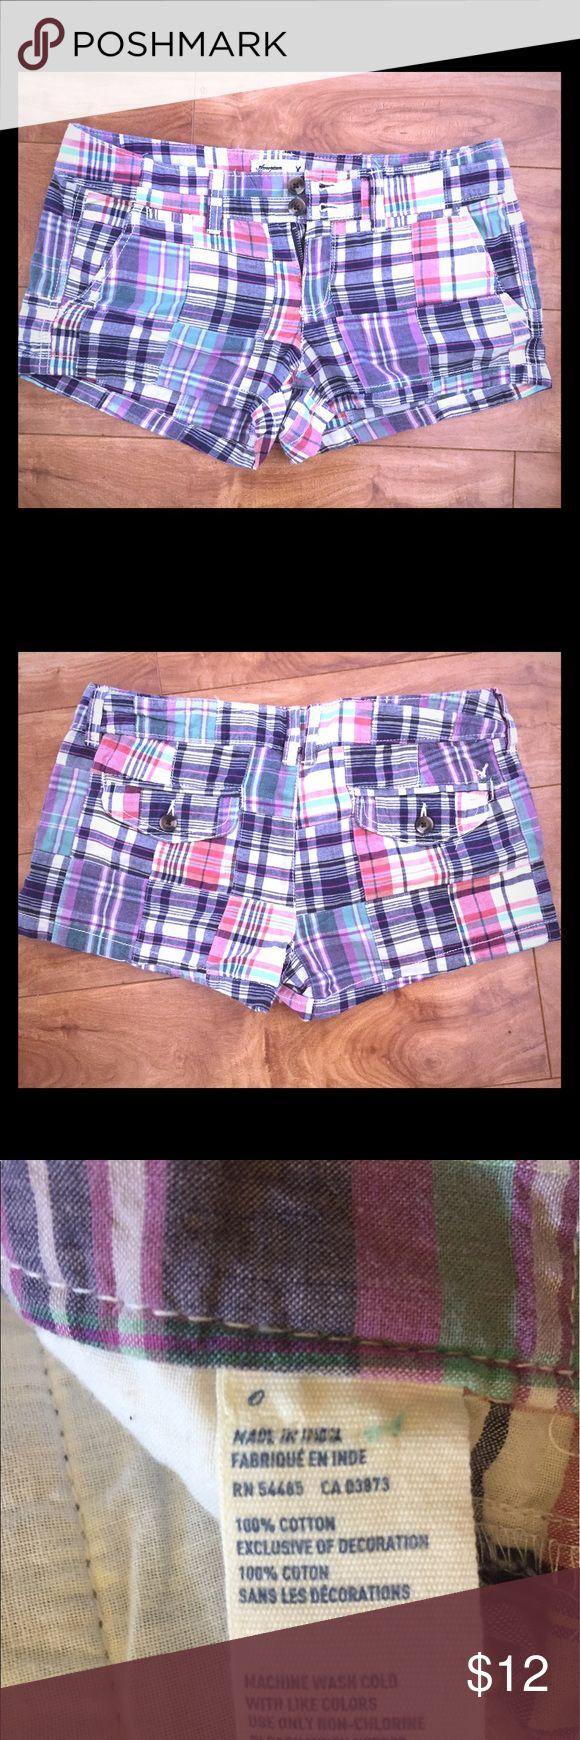 Sz 0 preppy plaid nautical shorts AEO NWT Super cute AEO plaid shorts with back flap pockets. BNWT American Eagle Outfitters Shorts